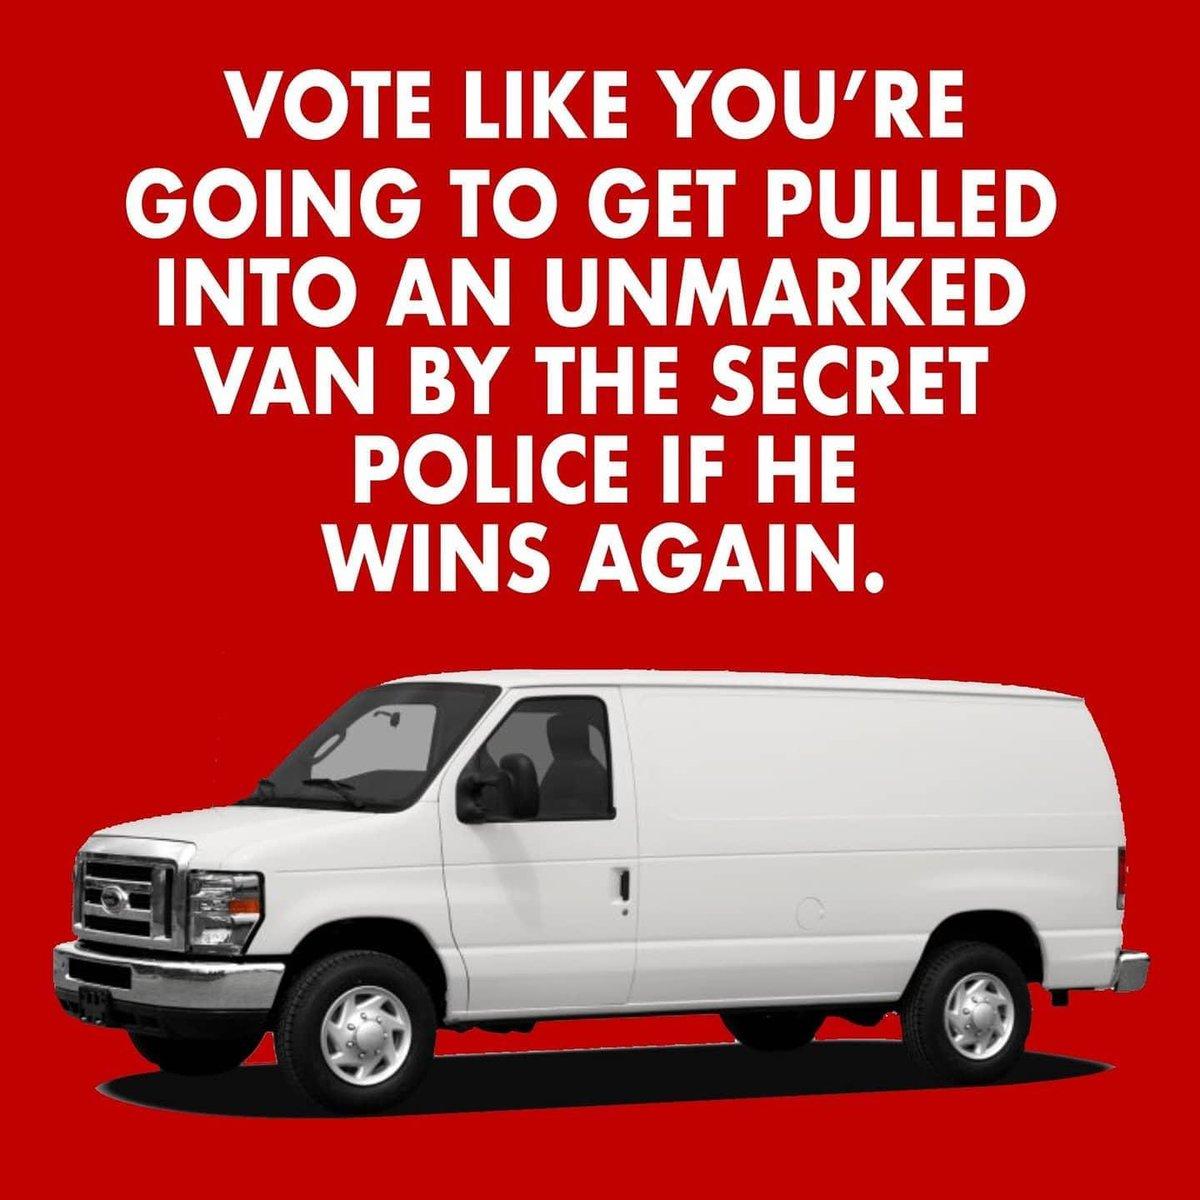 Real talk. #VoteBlueToSaveAmerica2020 #VoteBlueToEndThisNightmare